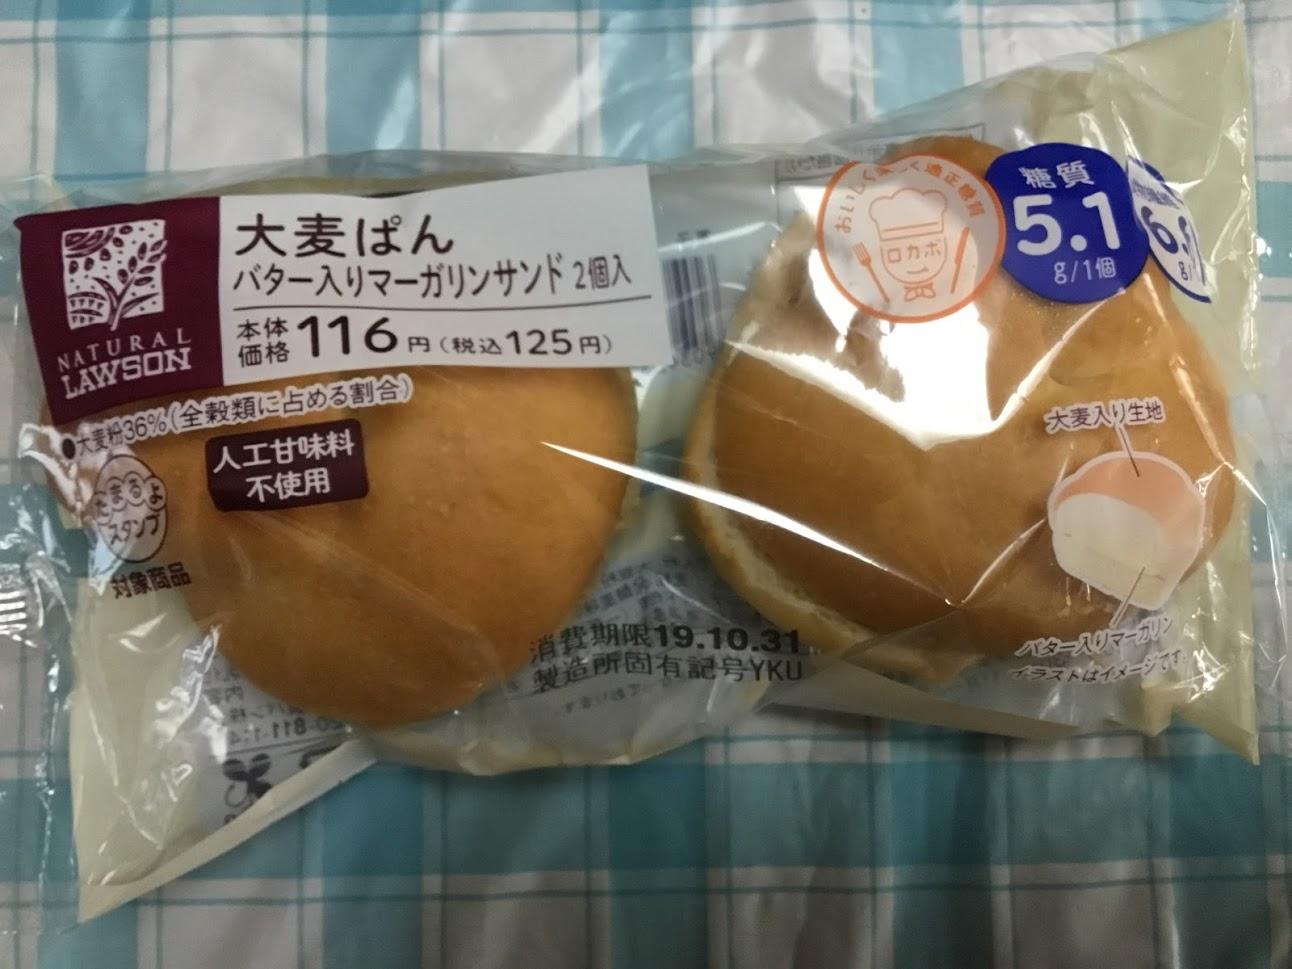 NL 大麦ぱん(バター入りマーガリンサンド) 2個入